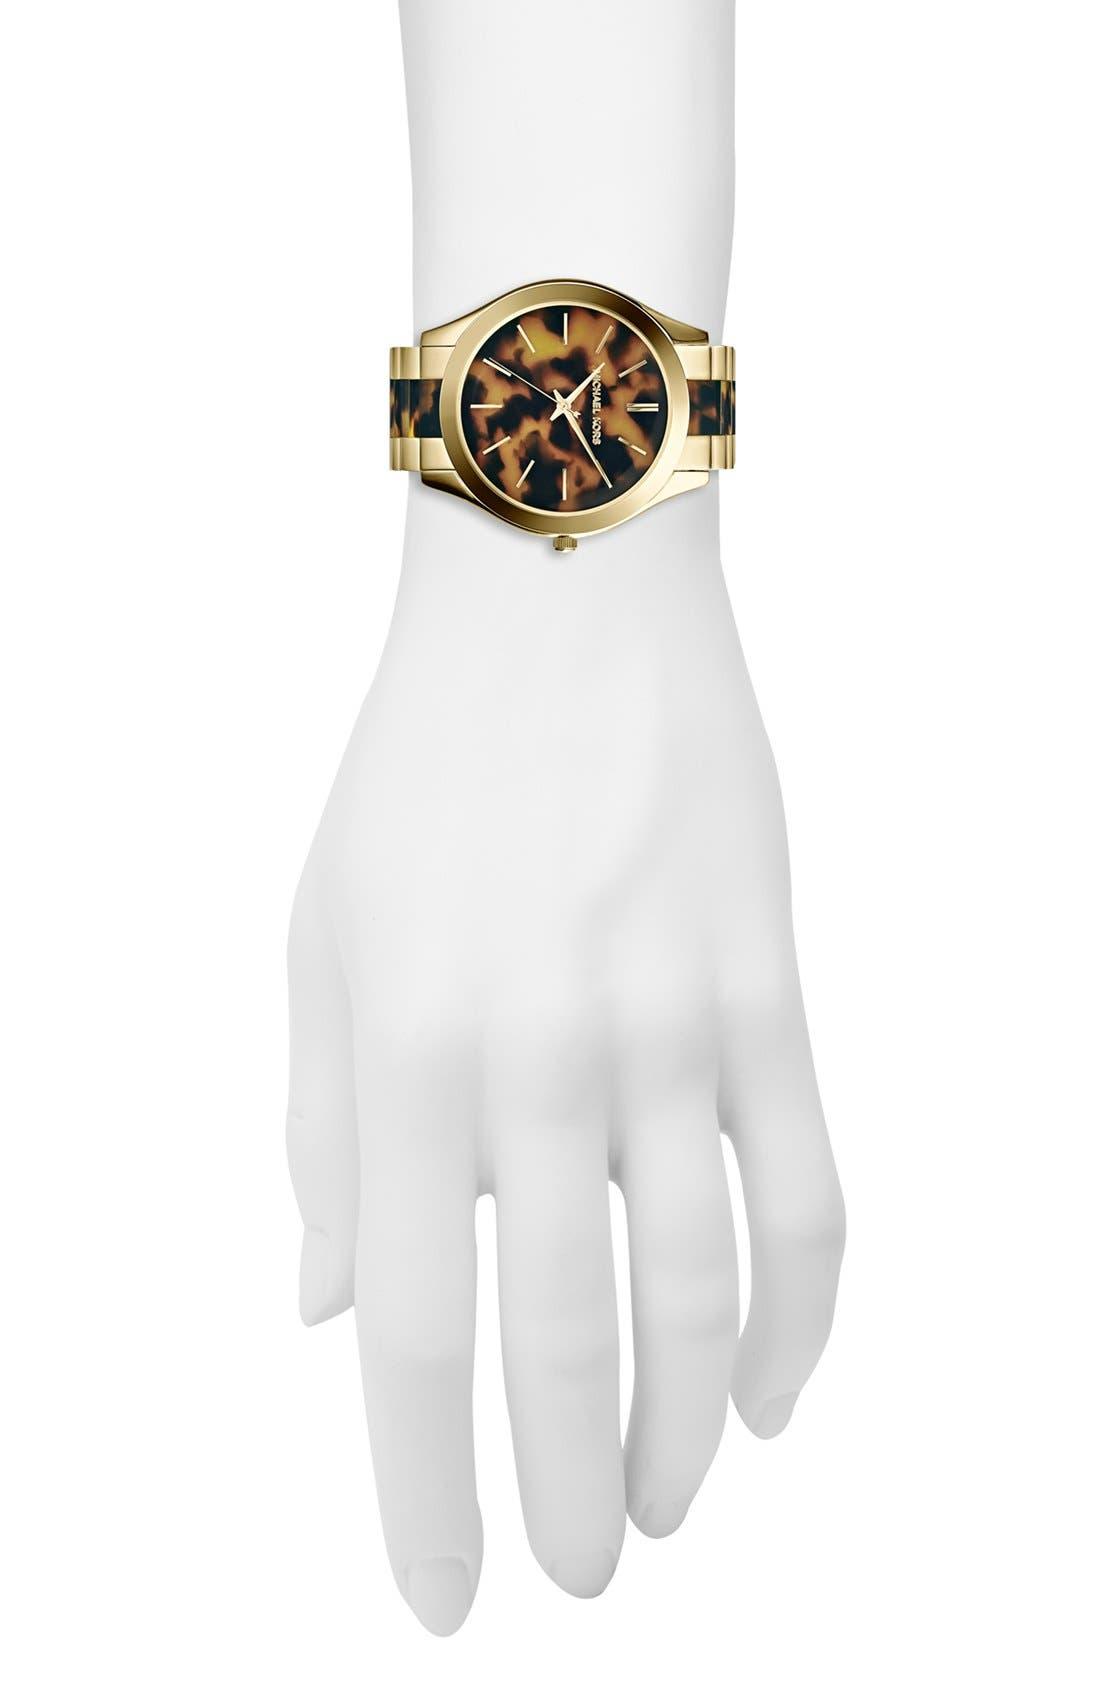 Michael Kors 'Slim Runway' Round Bracelet Watch, 42mm,                             Alternate thumbnail 4, color,                             Tortoise/ Gold